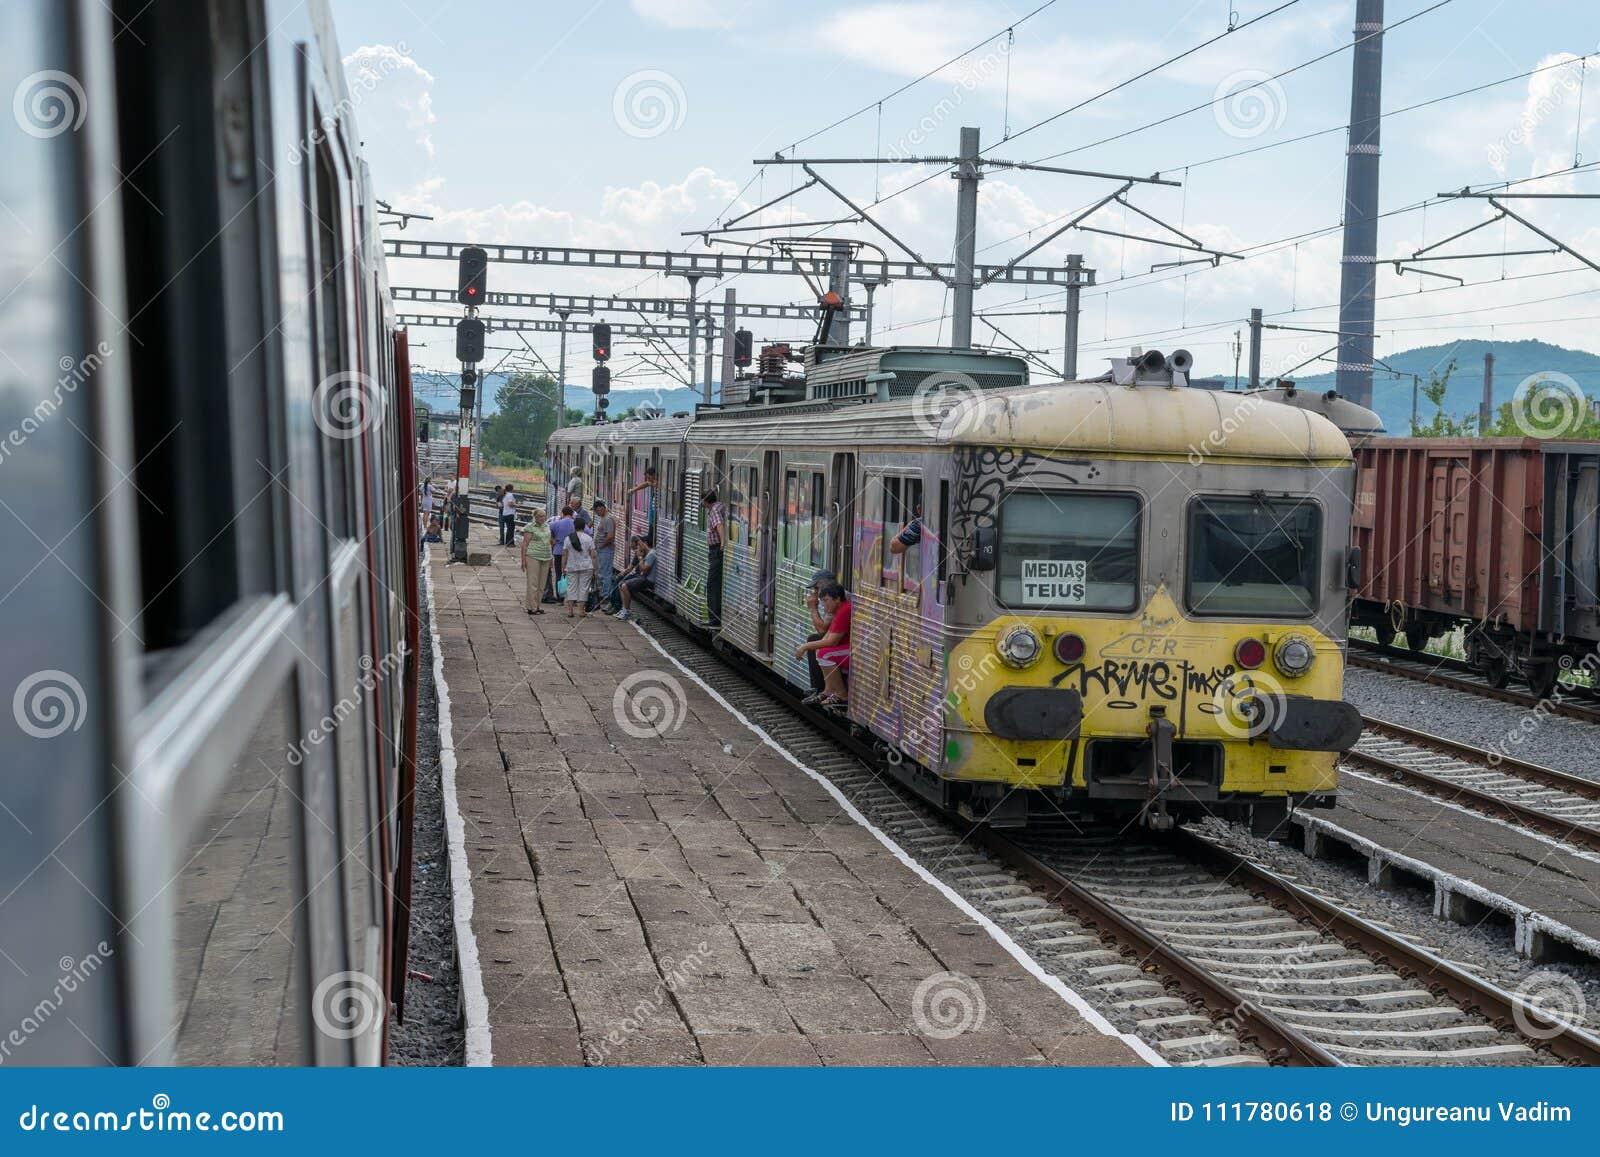 TRANSYLVANIA REGION, ROMANIA - 1 JULY 2016: People waiting for the train to go on in rural Transylvania, Romania.